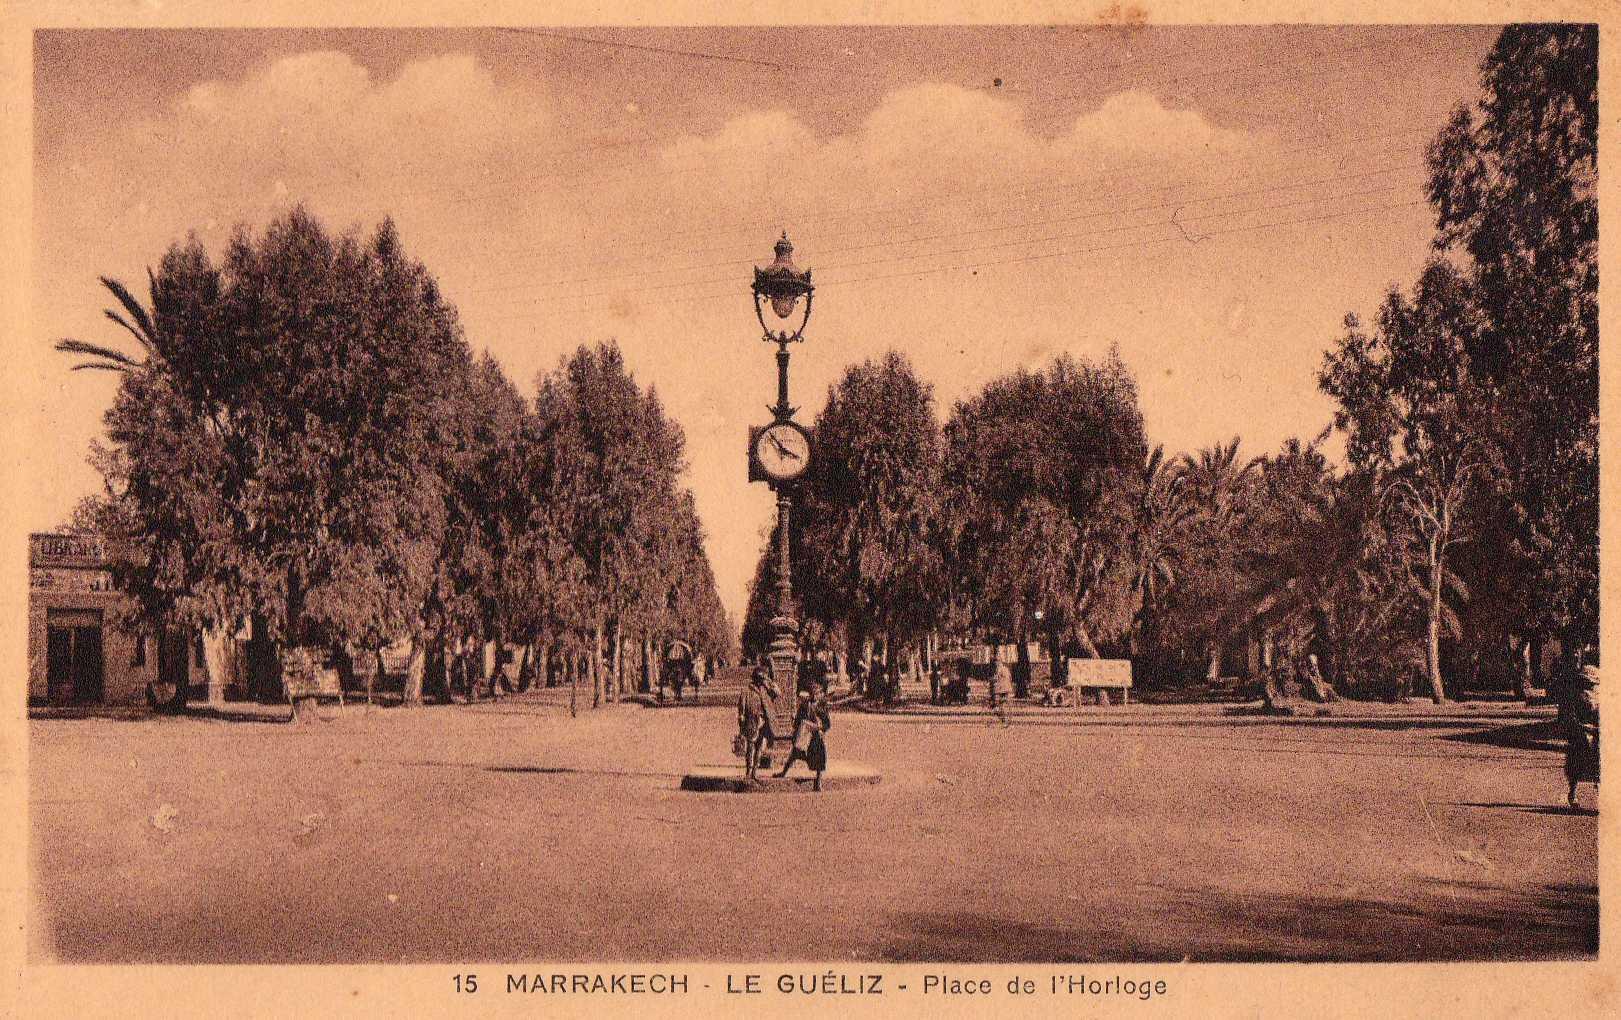 SOS arbres de Marrakech en péril